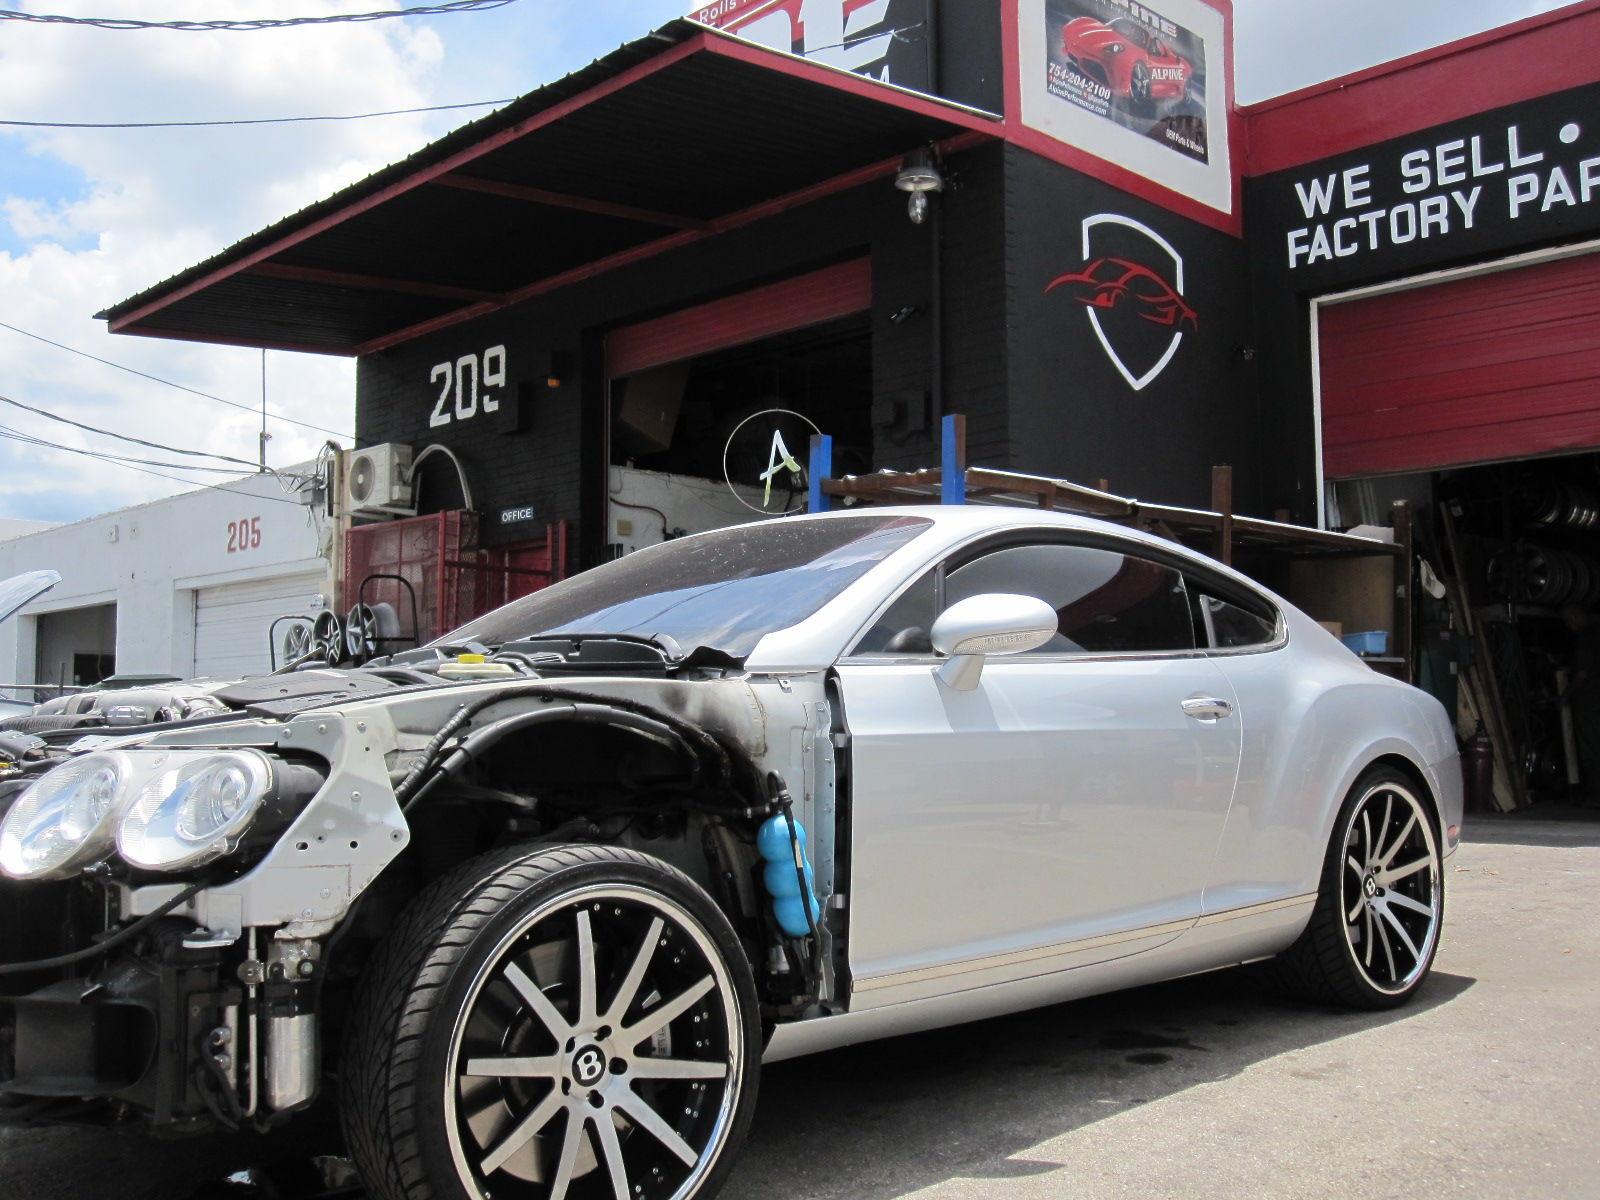 Img Cb C B Ffab C A Bbbe D on 2005 Bentley Continental Gt Forums